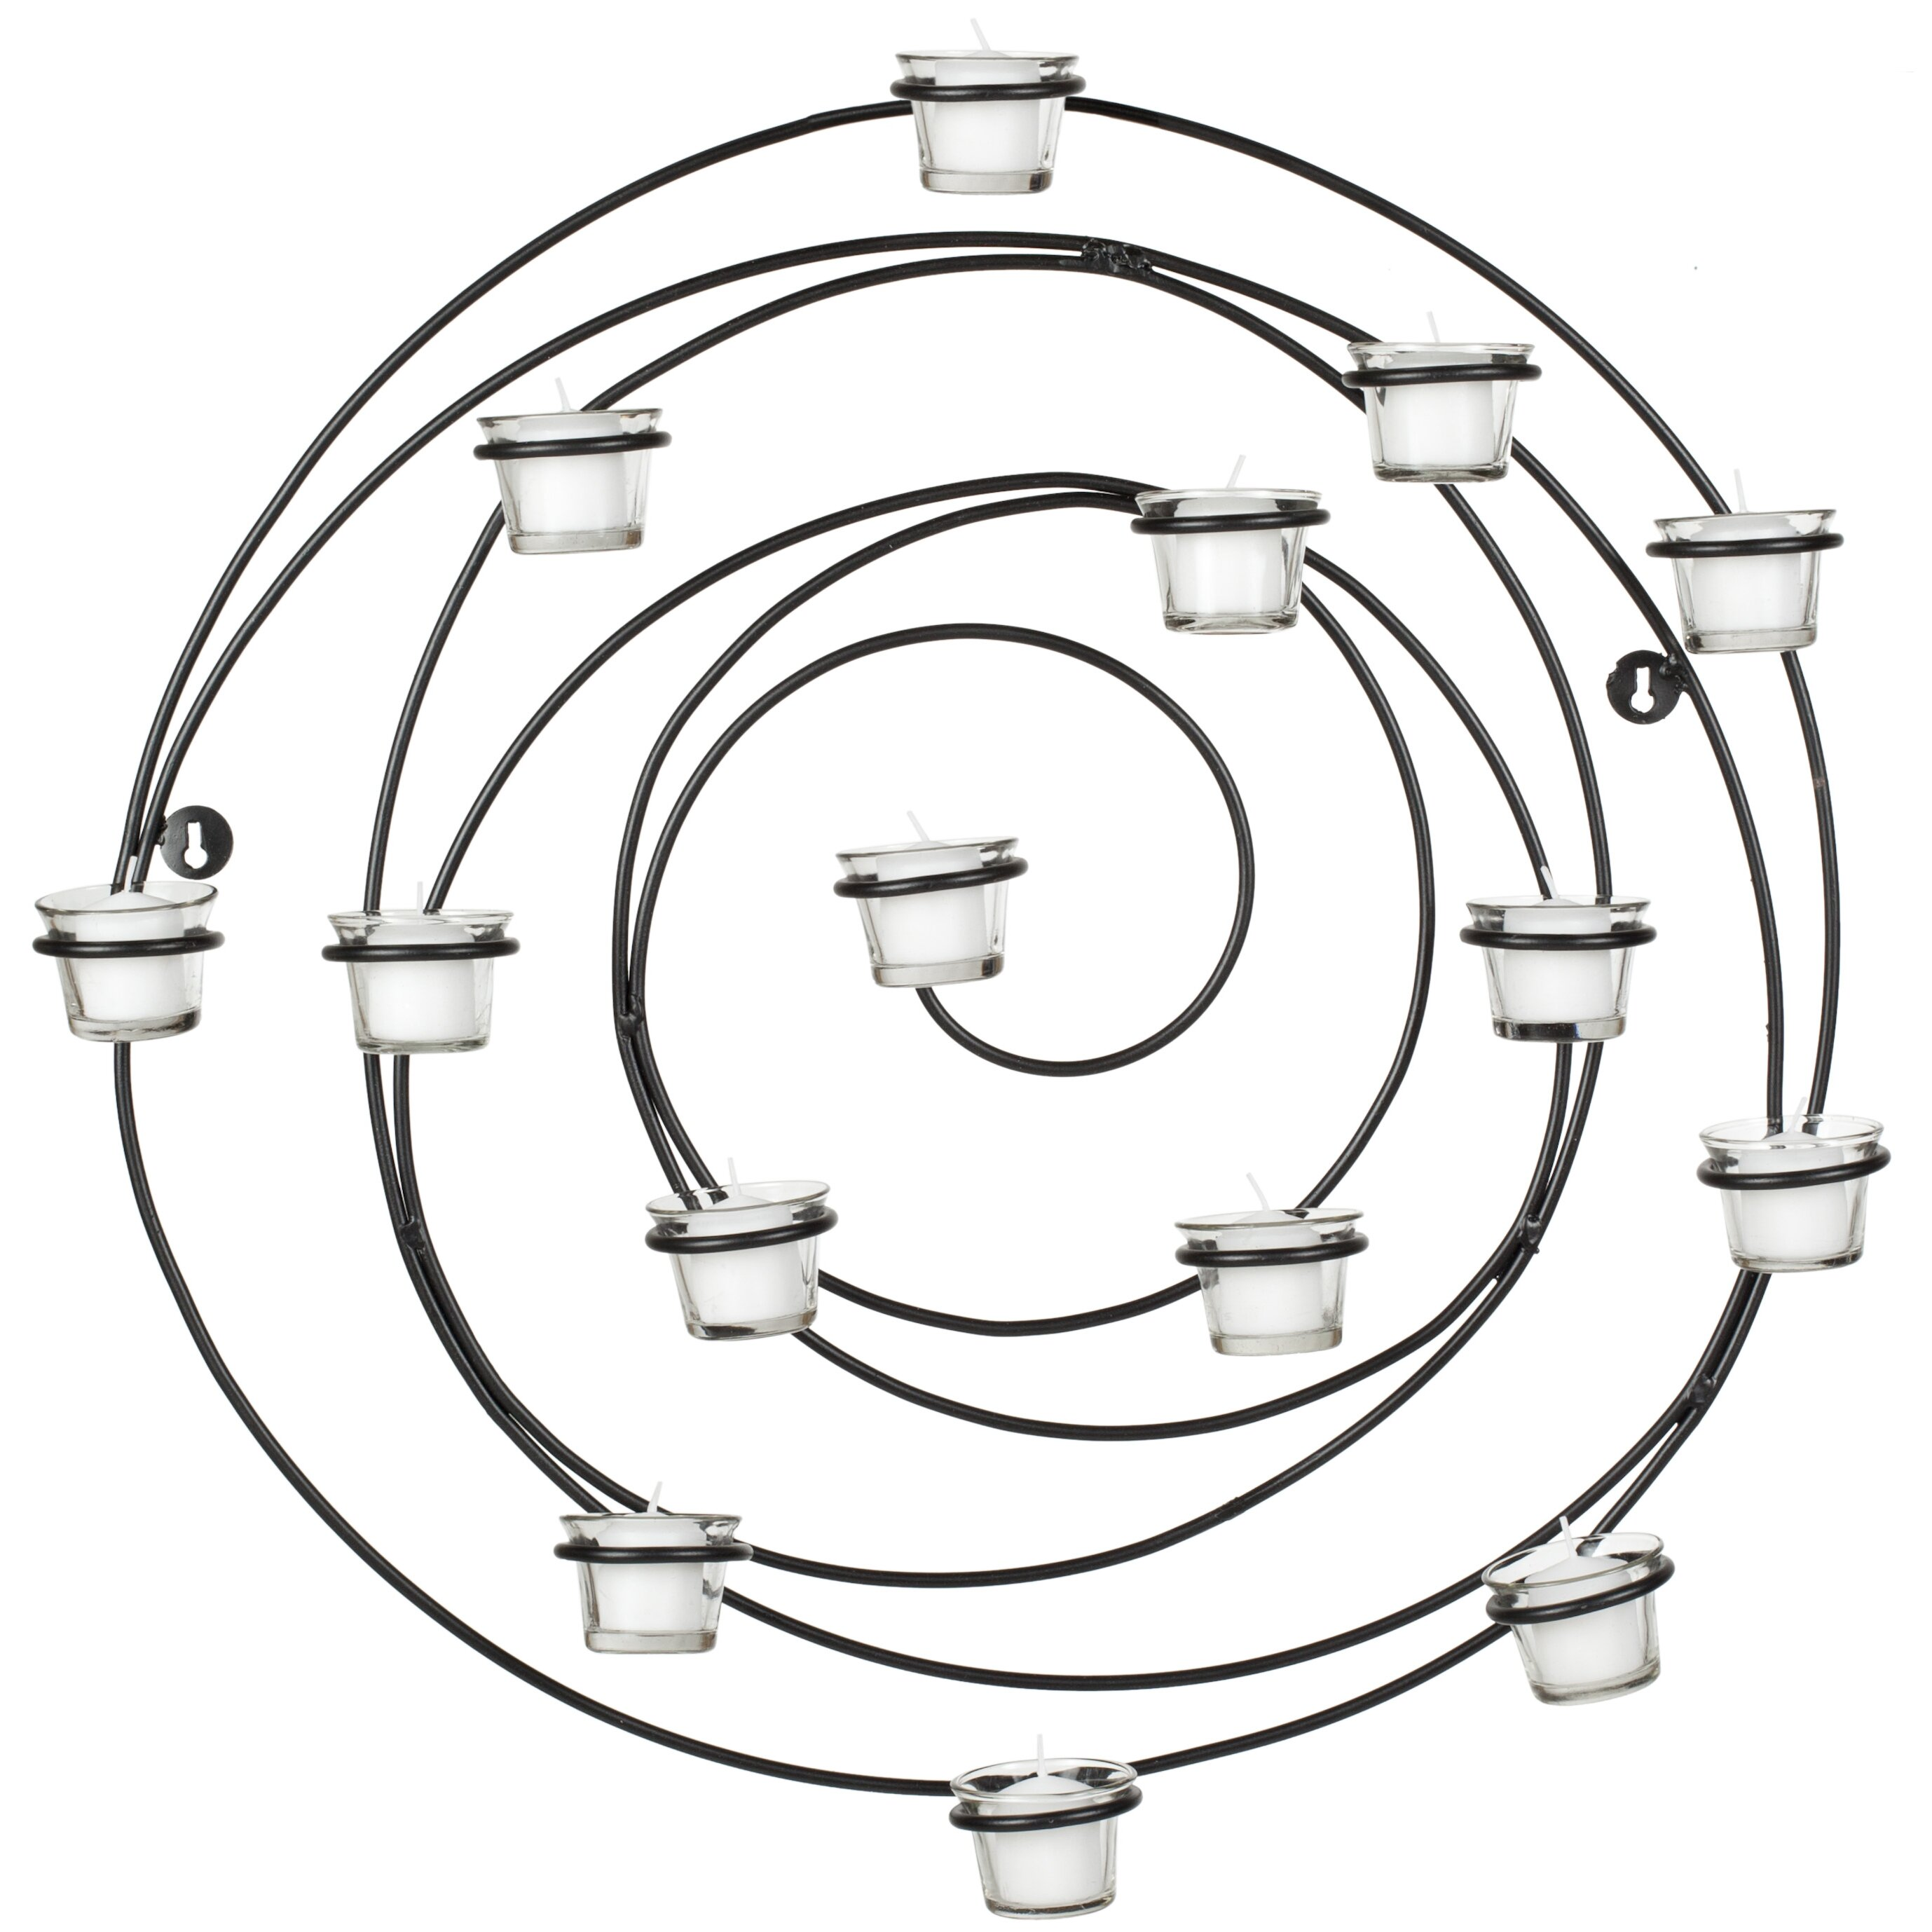 eaton manual transfer switch wiring diagram eaton discover your eaton transformer wiring diagram fire pump